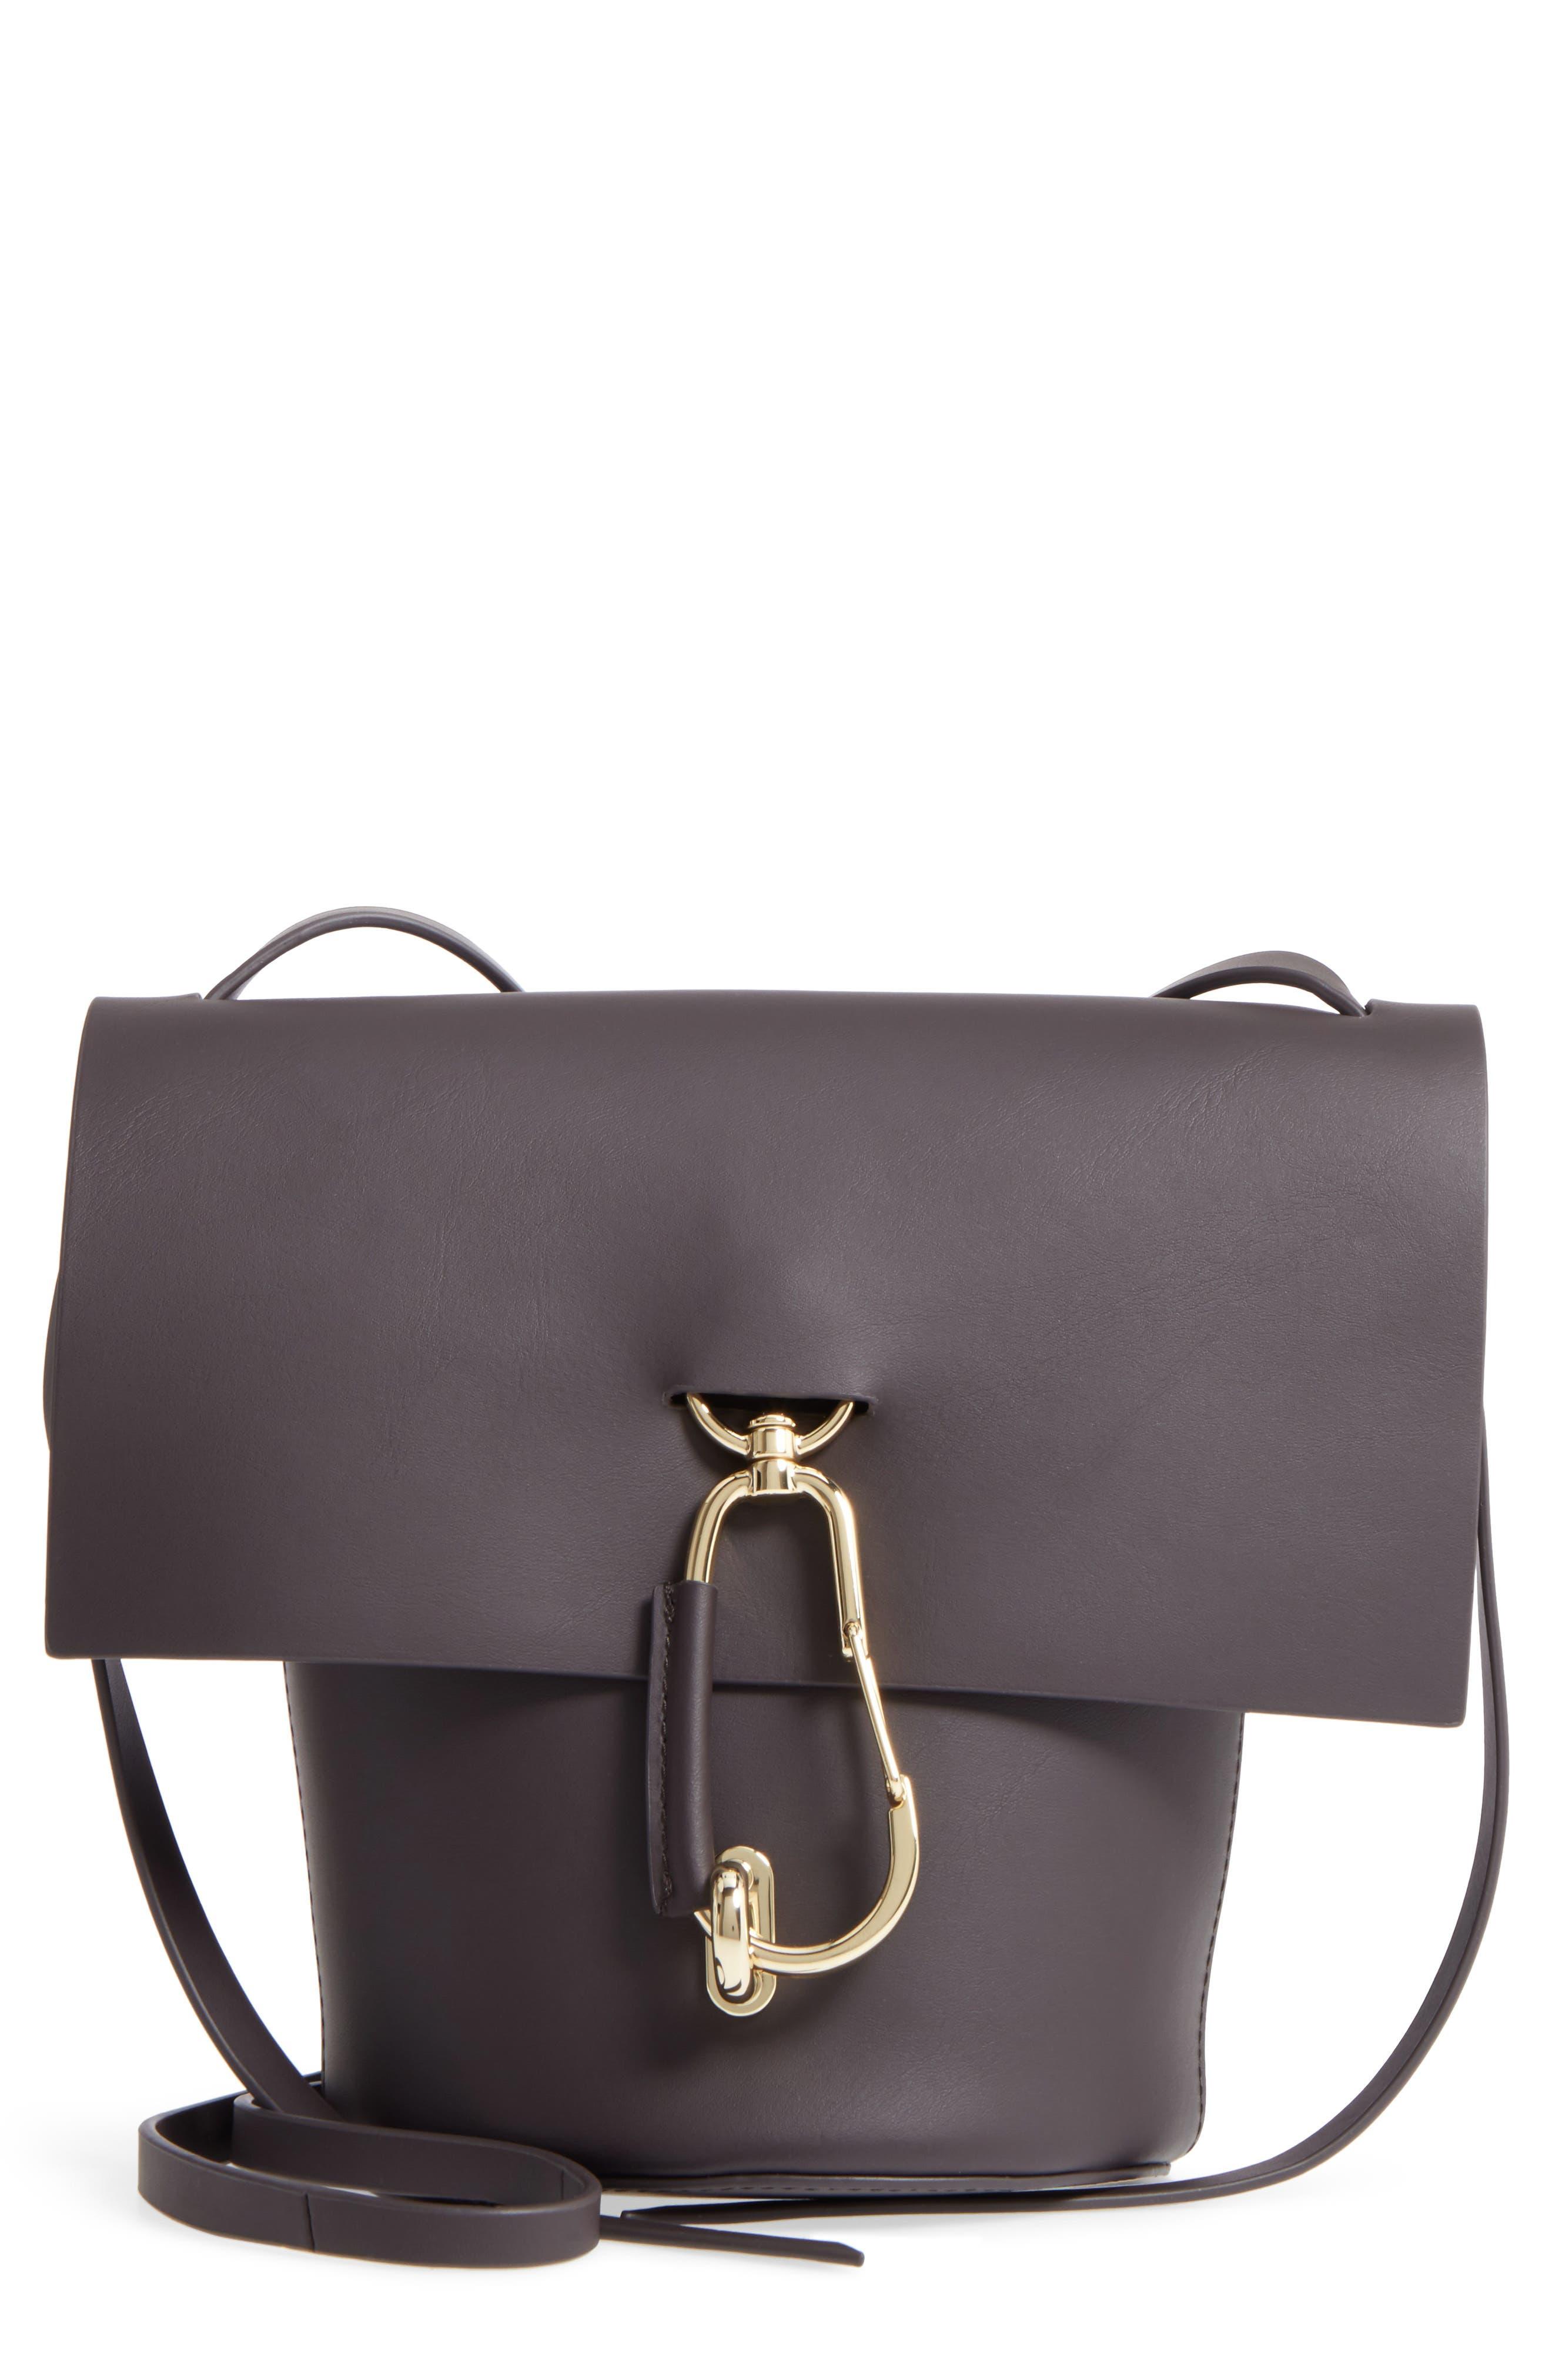 Main Image - ZAC Zac Posen Belay Calfskin Leather Crossbody Bucket Bag